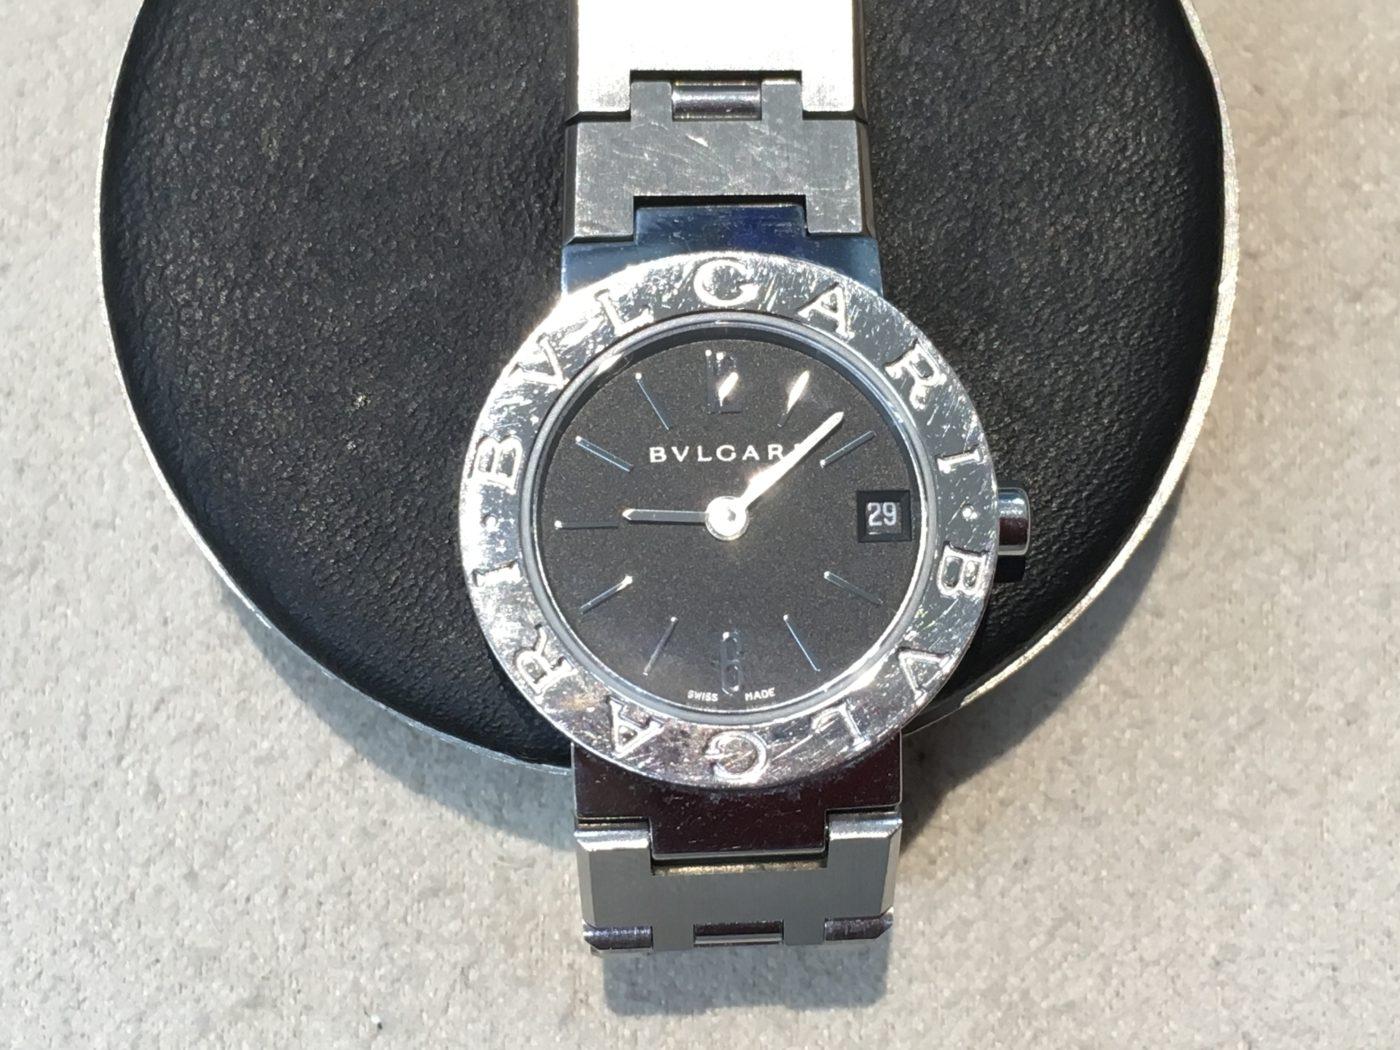 BVLGARI ブルガリ 腕時計 電池交換